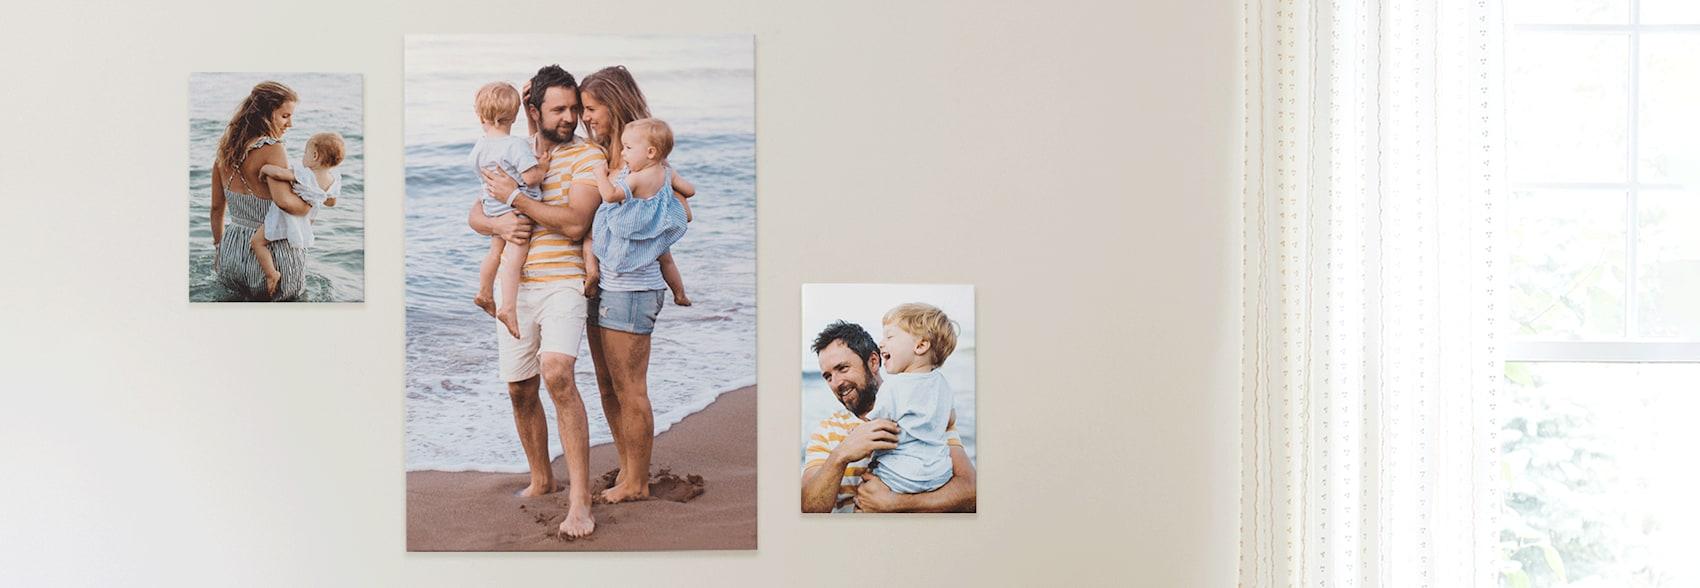 Canvas photo printing online